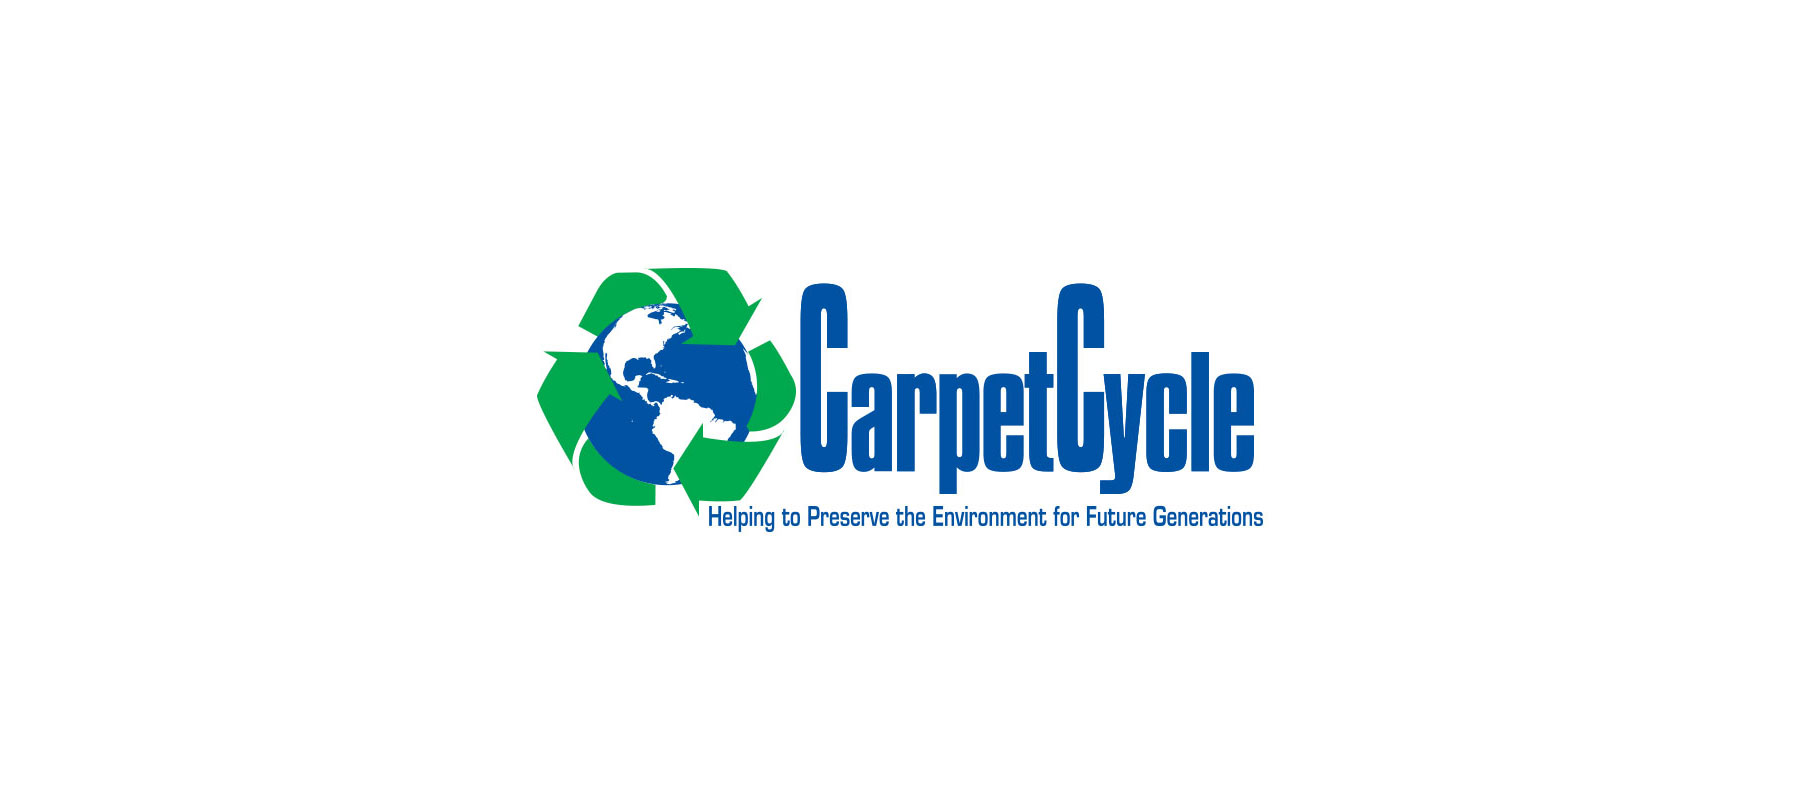 Tri-State LED Provides LED Lighting Technologies for CarpetCycle, LLC